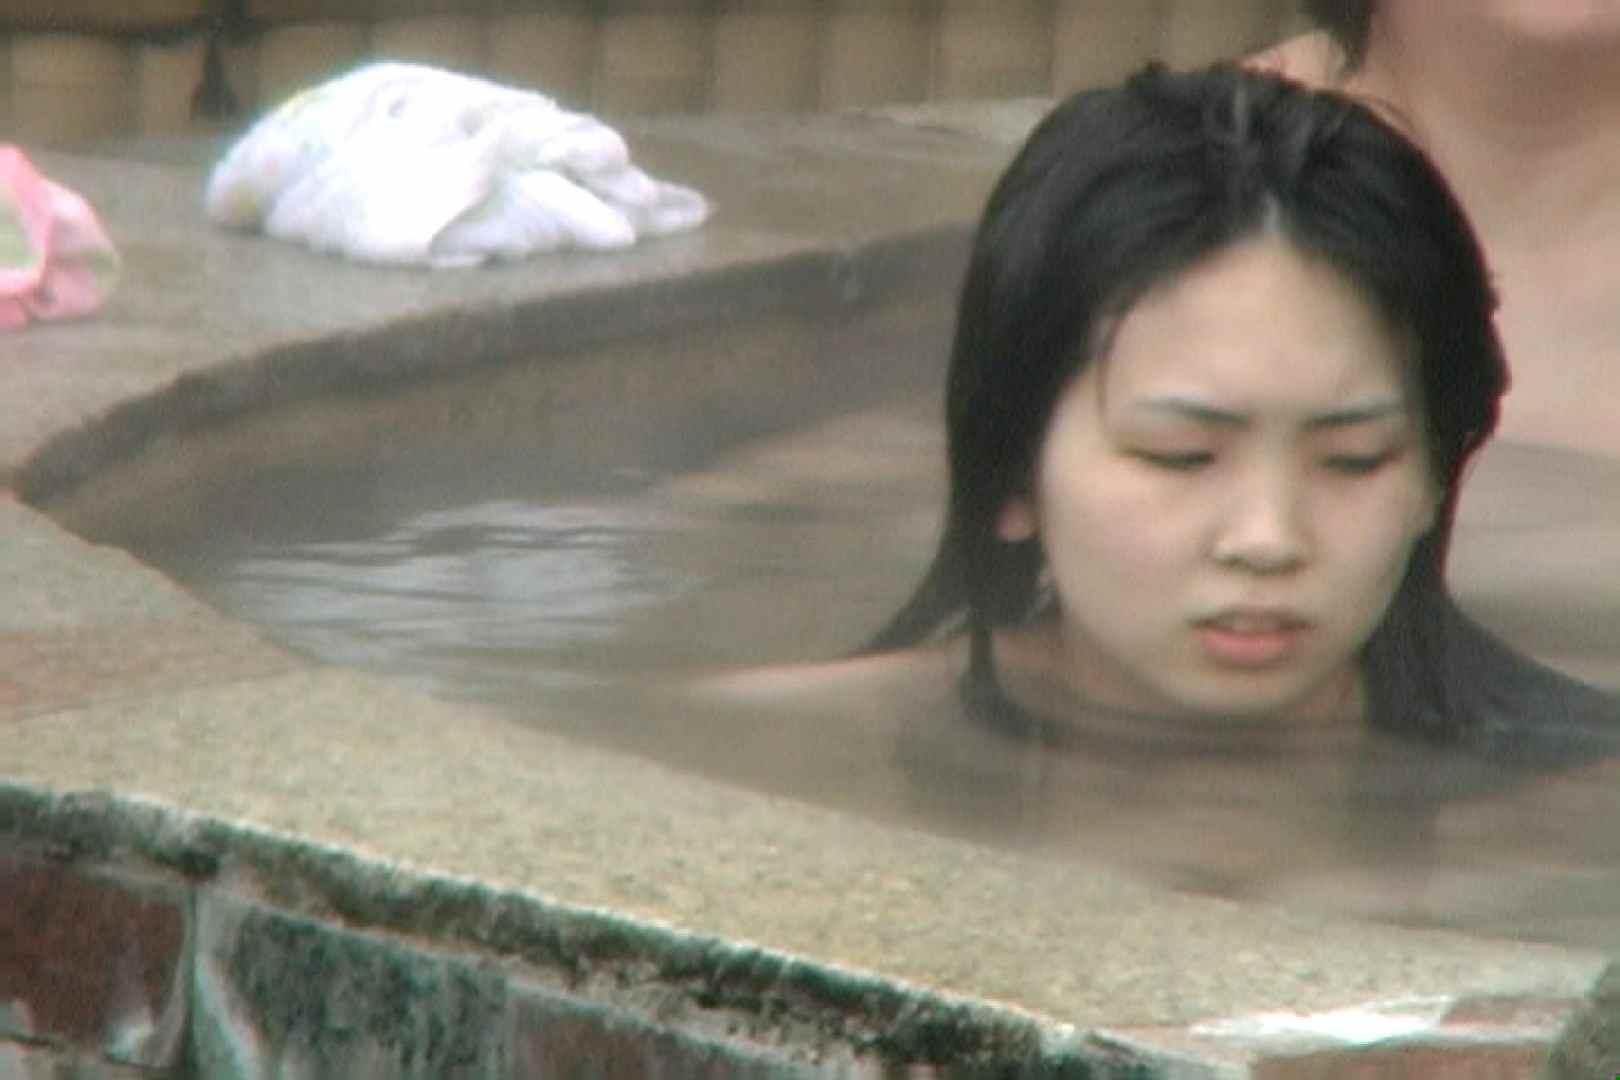 Aquaな露天風呂Vol.646 HなOL | 盗撮  89pic 67